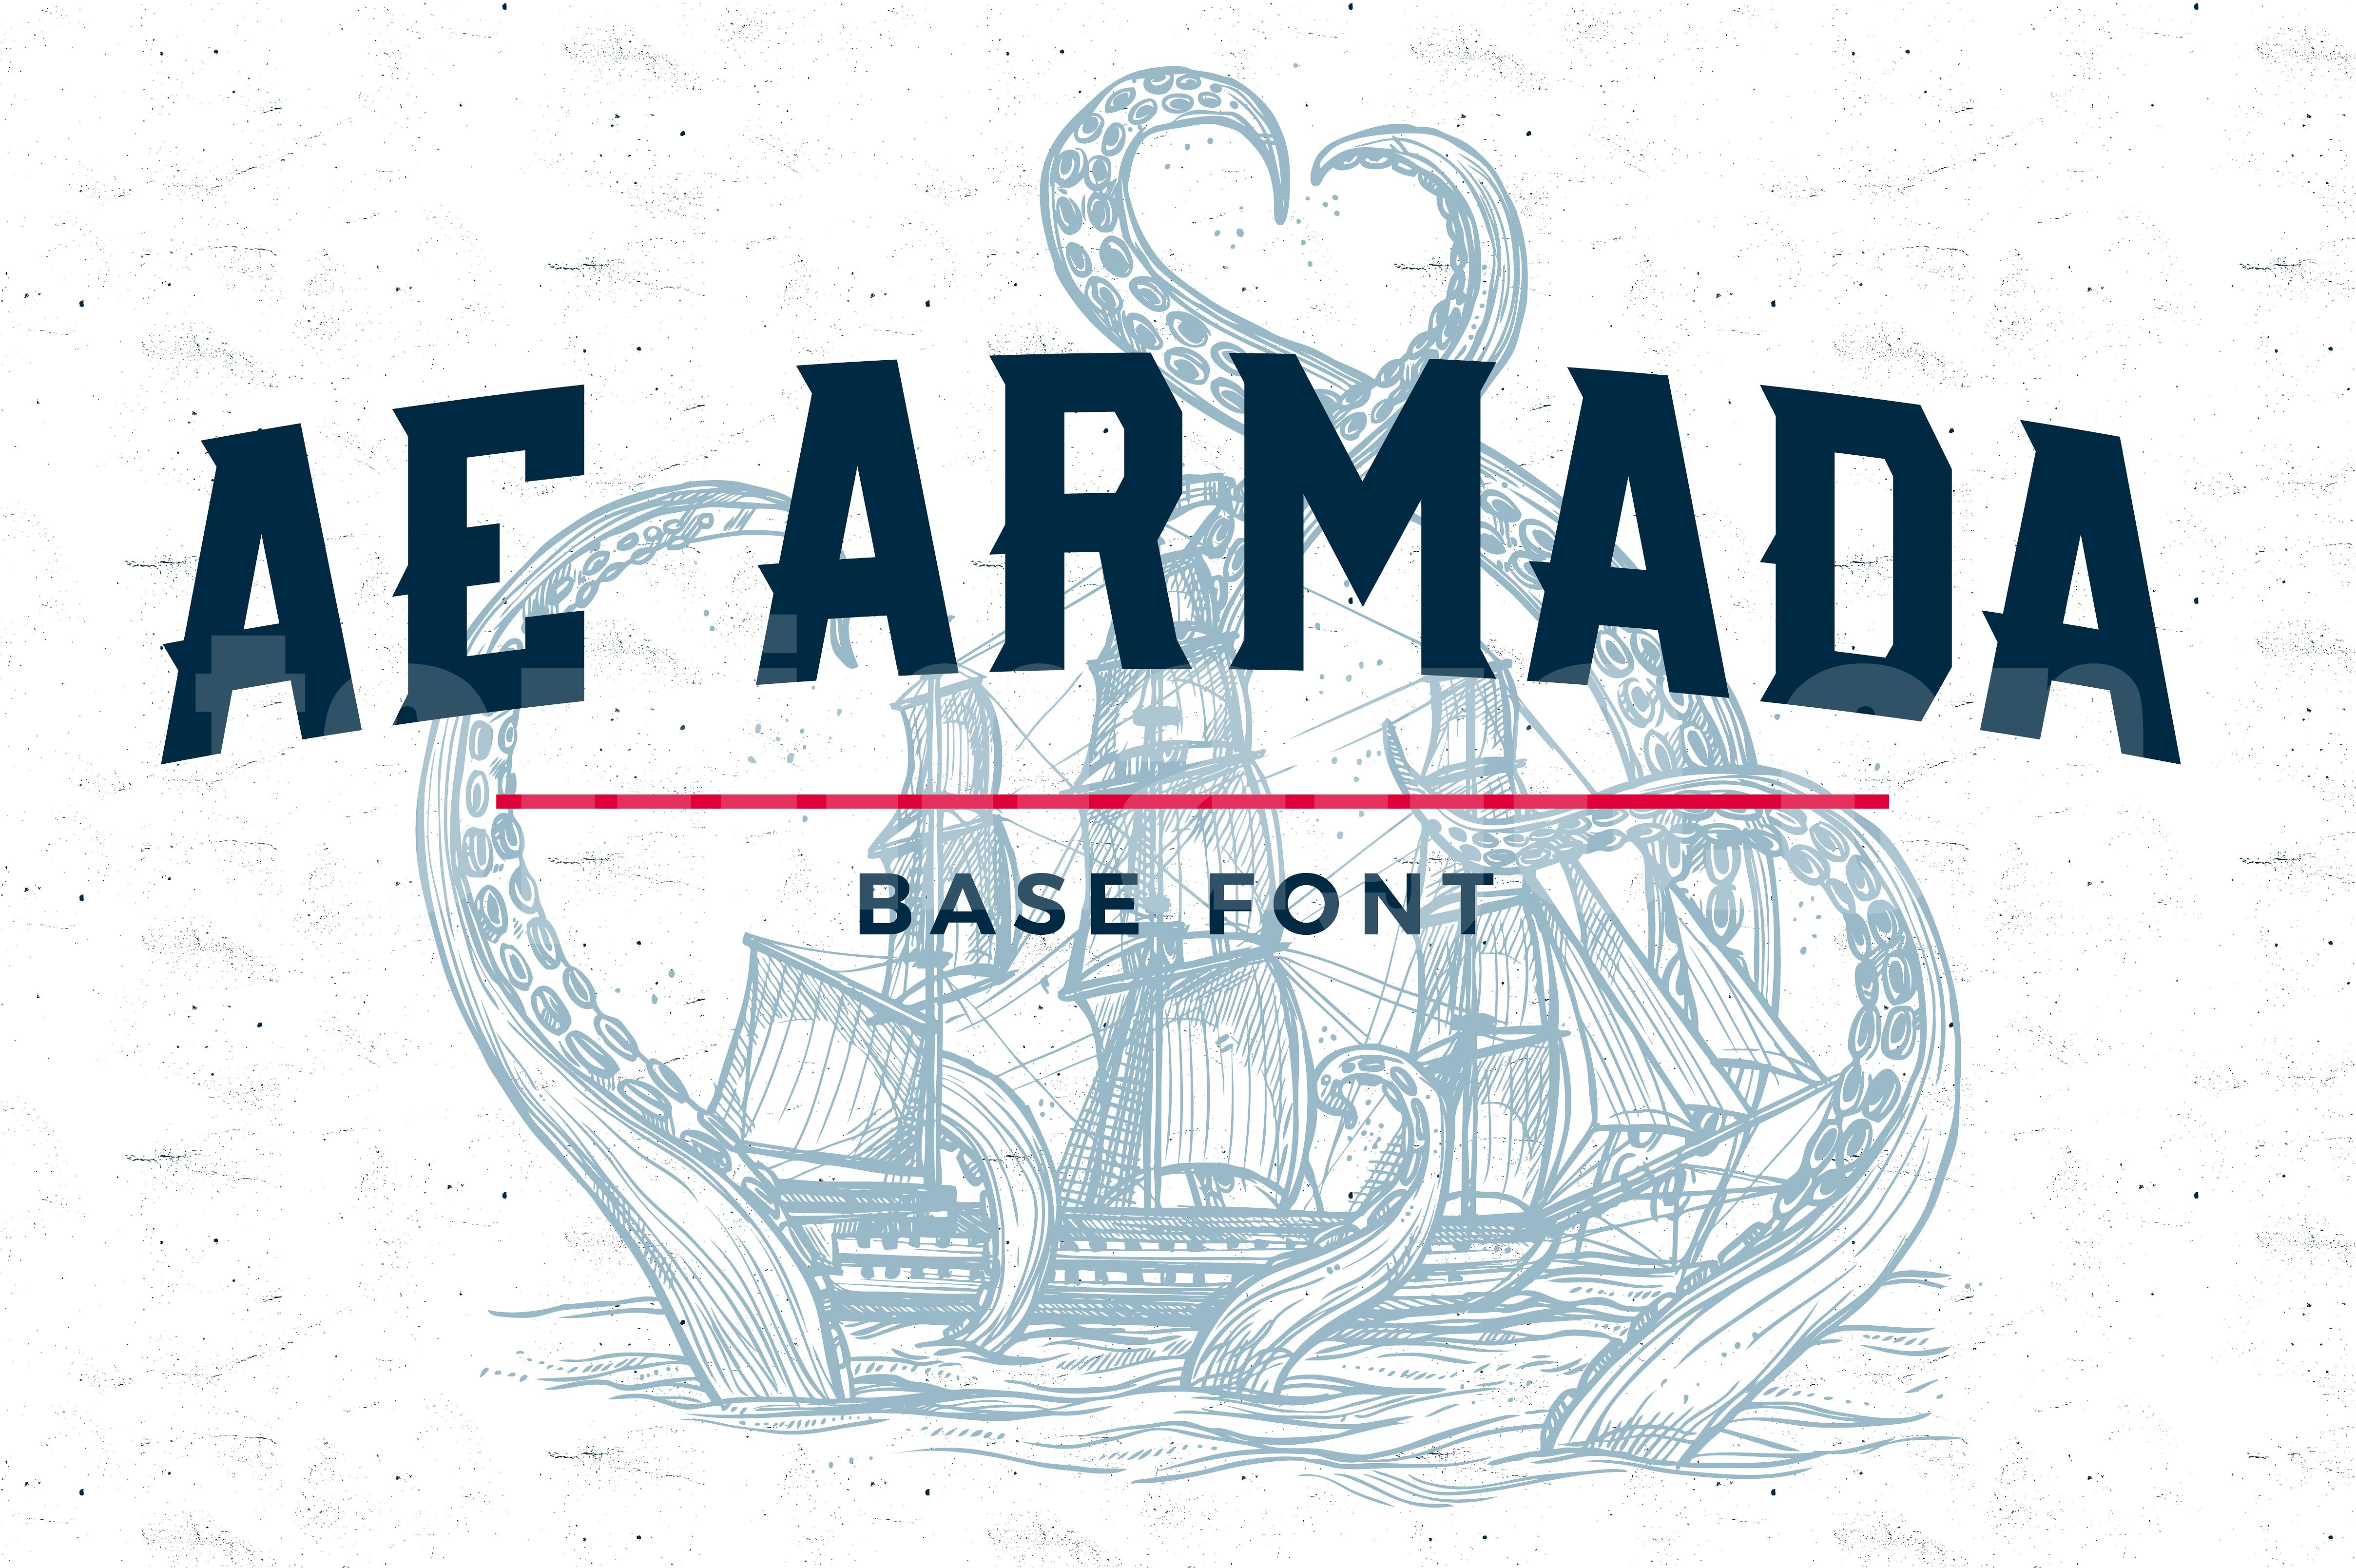 AE-Armada-Base复古个性艺术英文字体下载